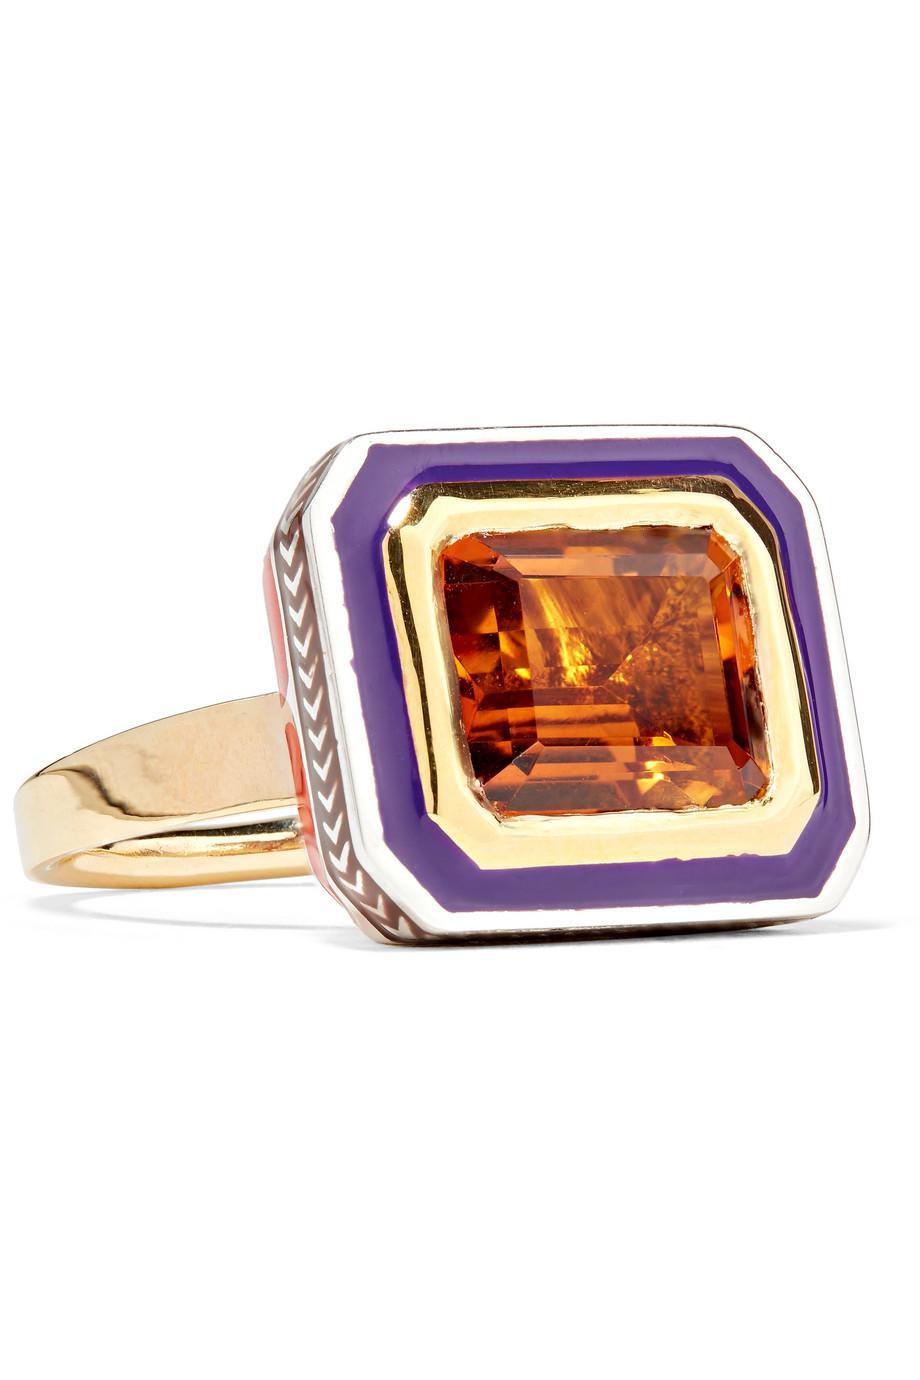 Alice Cicolini Tile 22-karat Gold, Sterling Silver, Topaz And Enamel Ring